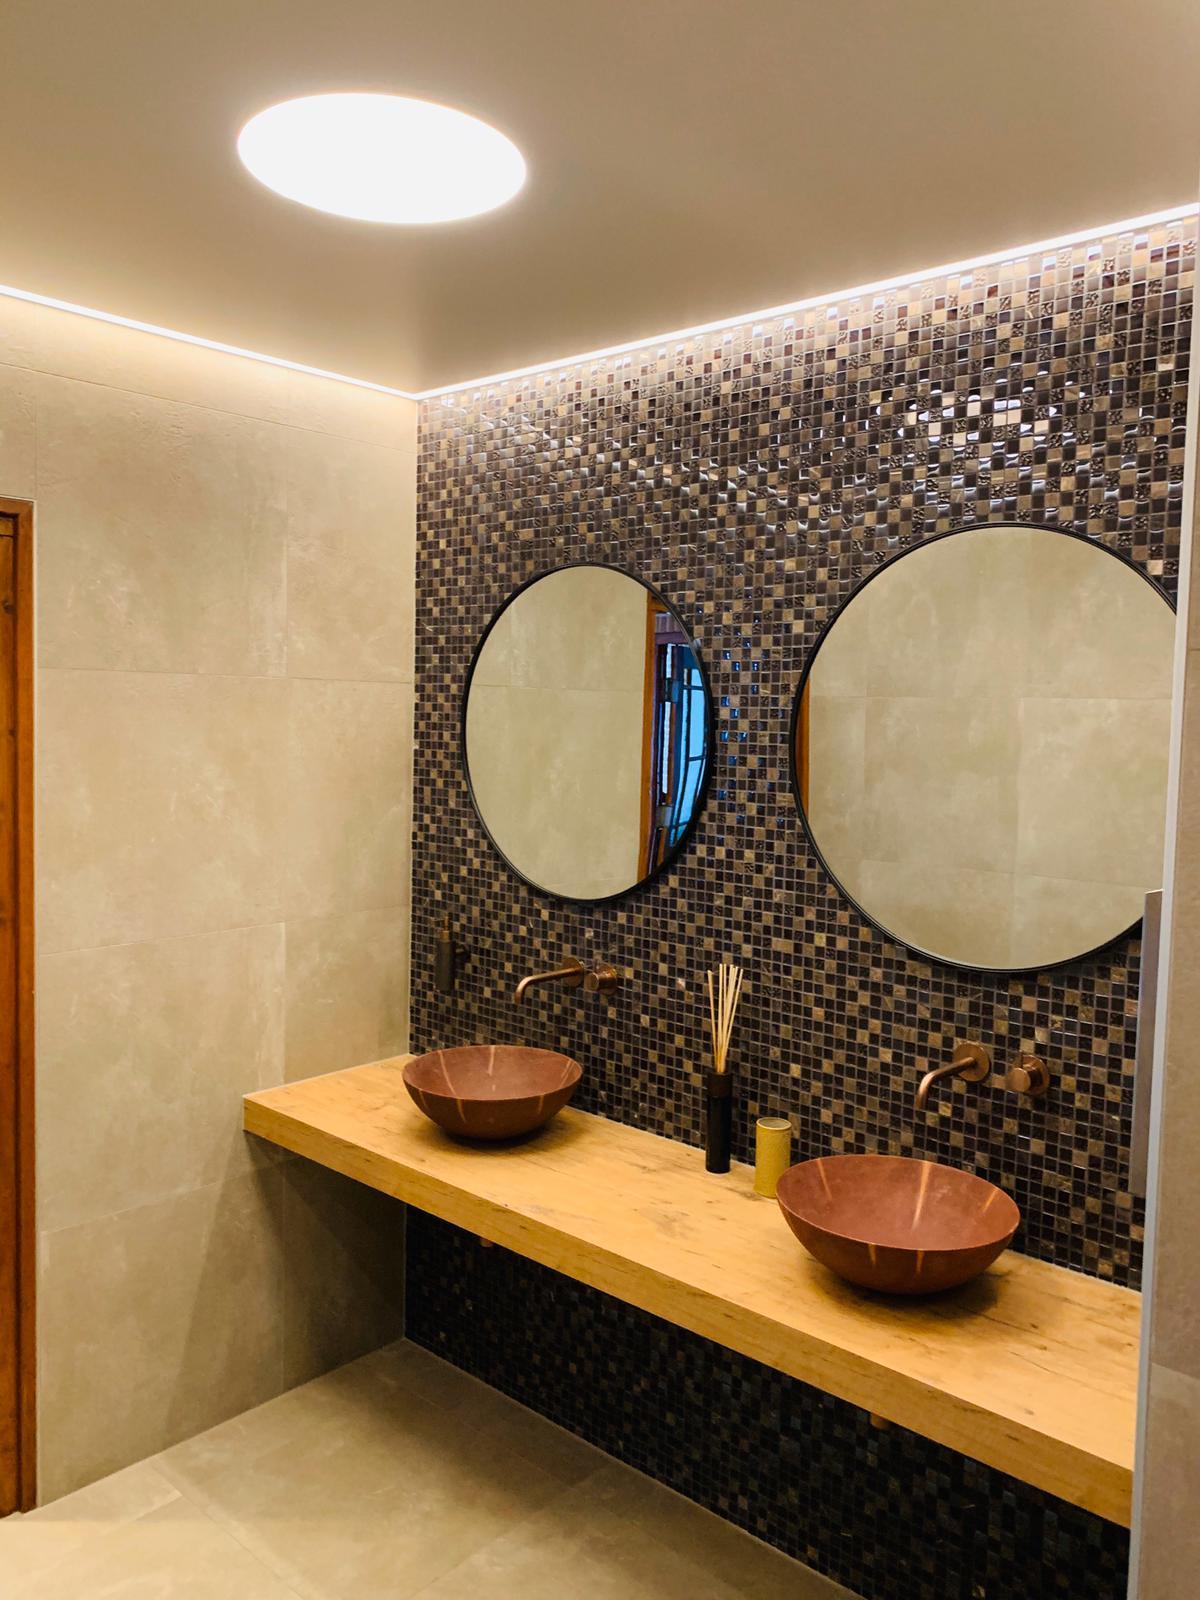 spanplafond en cirkel LED verlichting in badkamers